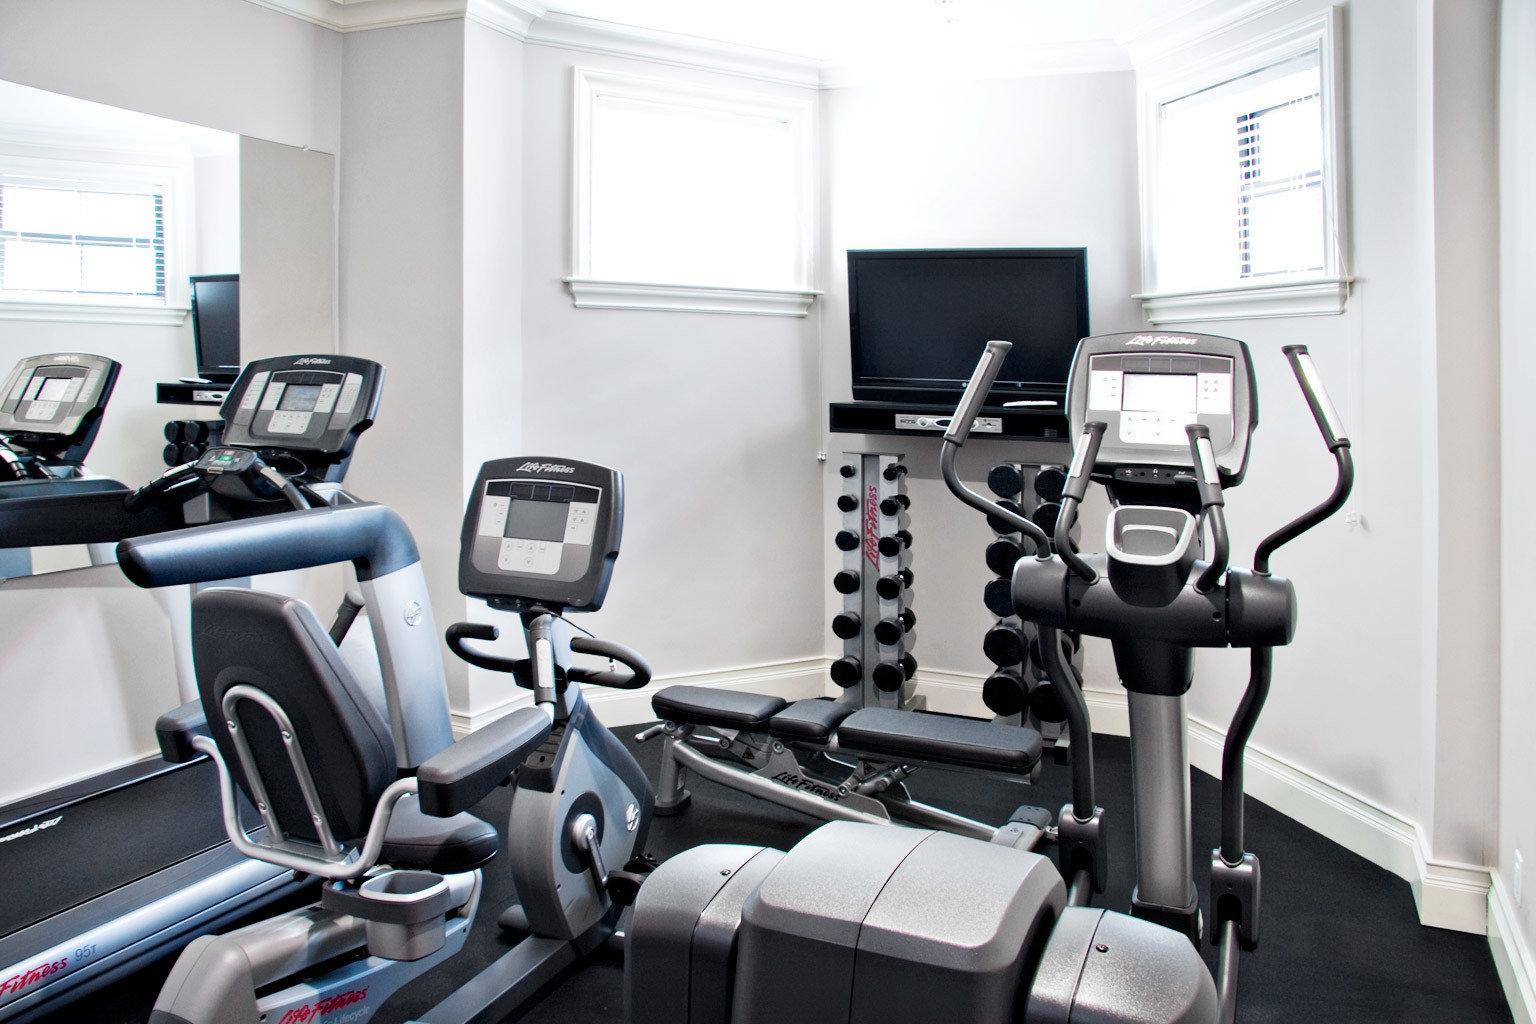 structure sport venue gym exercise device